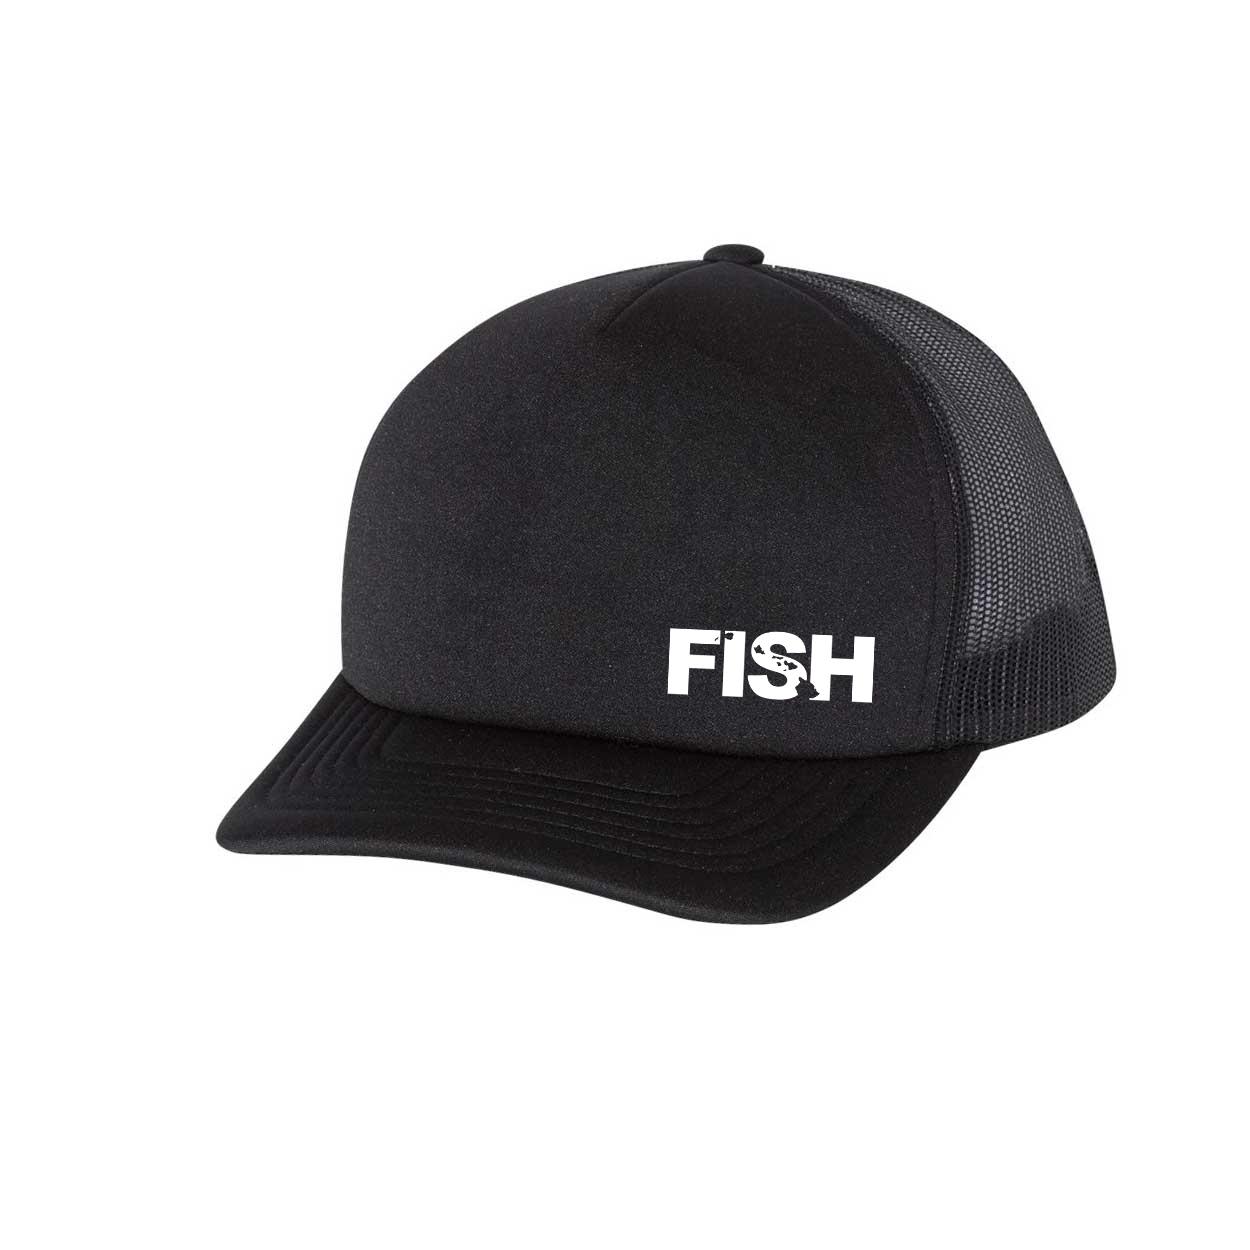 Fish Hawaii Night Out Premium Foam Trucker Snapback Hat Black (White Logo)